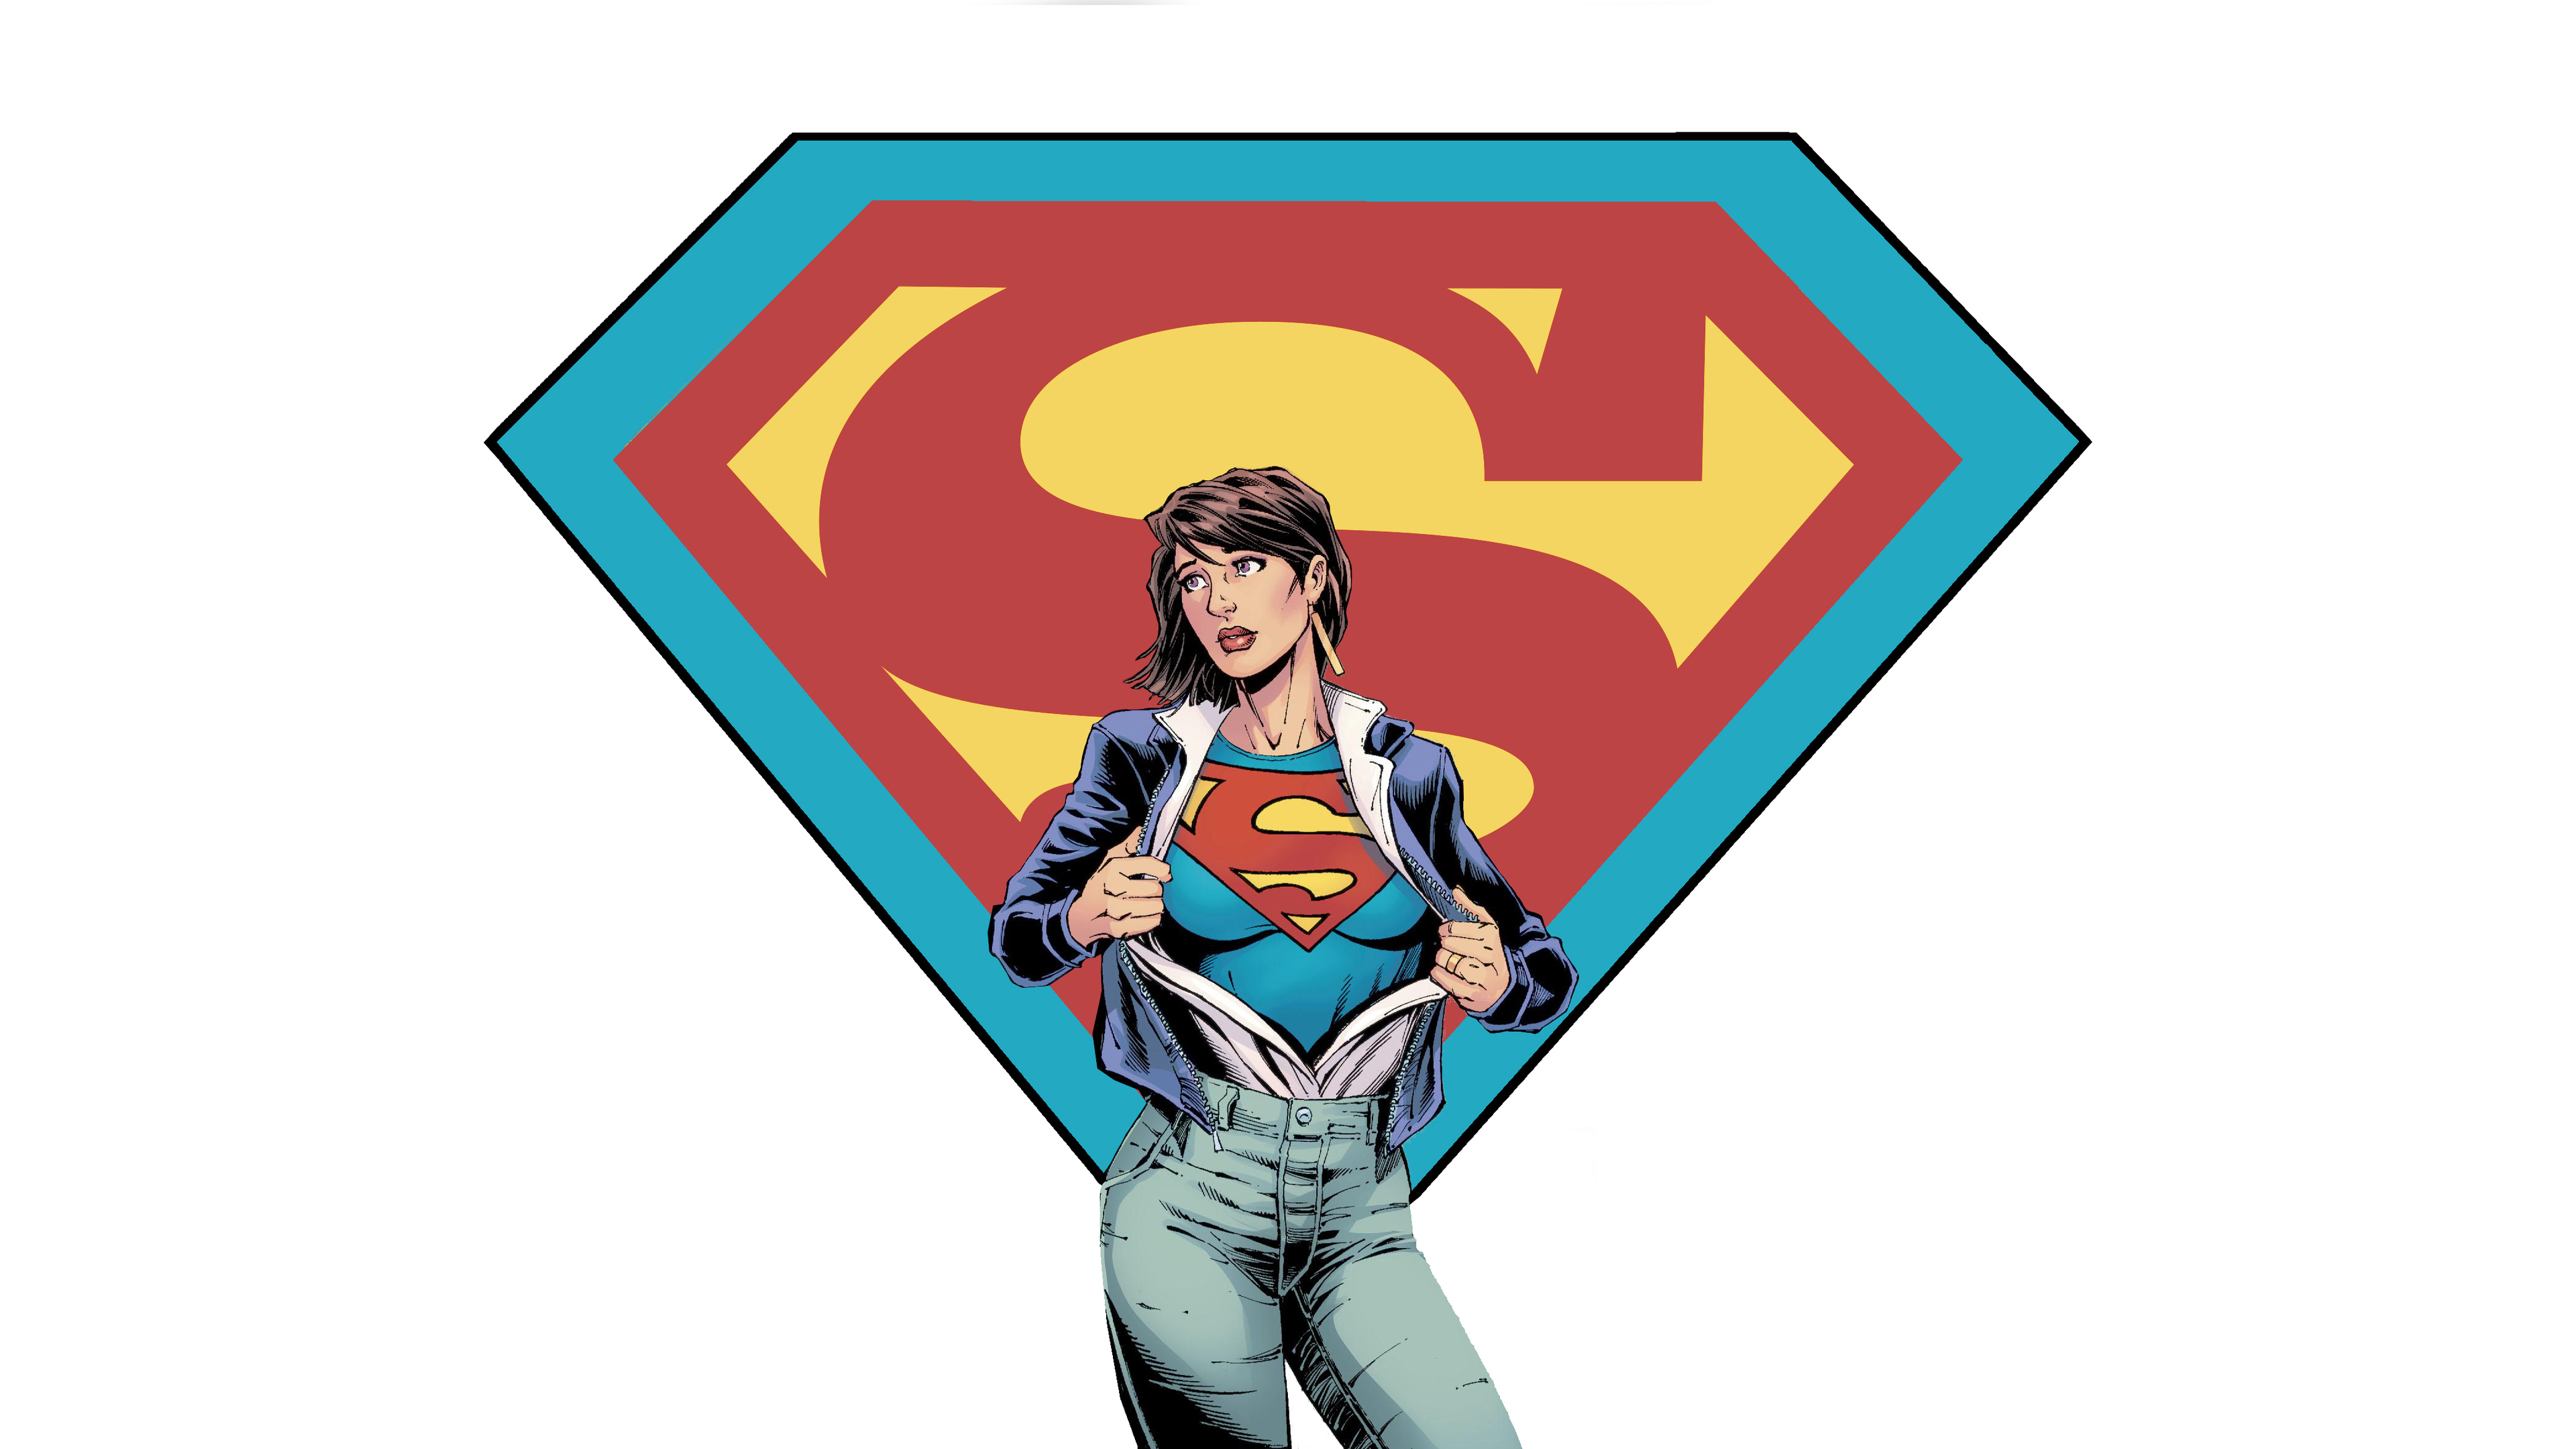 supergirl digital art 4k 1553070986 - Supergirl Digital Art 4k - superheroes wallpapers, supergirl wallpapers, hd-wallpapers, digital art wallpapers, artwork wallpapers, artist wallpapers, 5k wallpapers, 4k-wallpapers